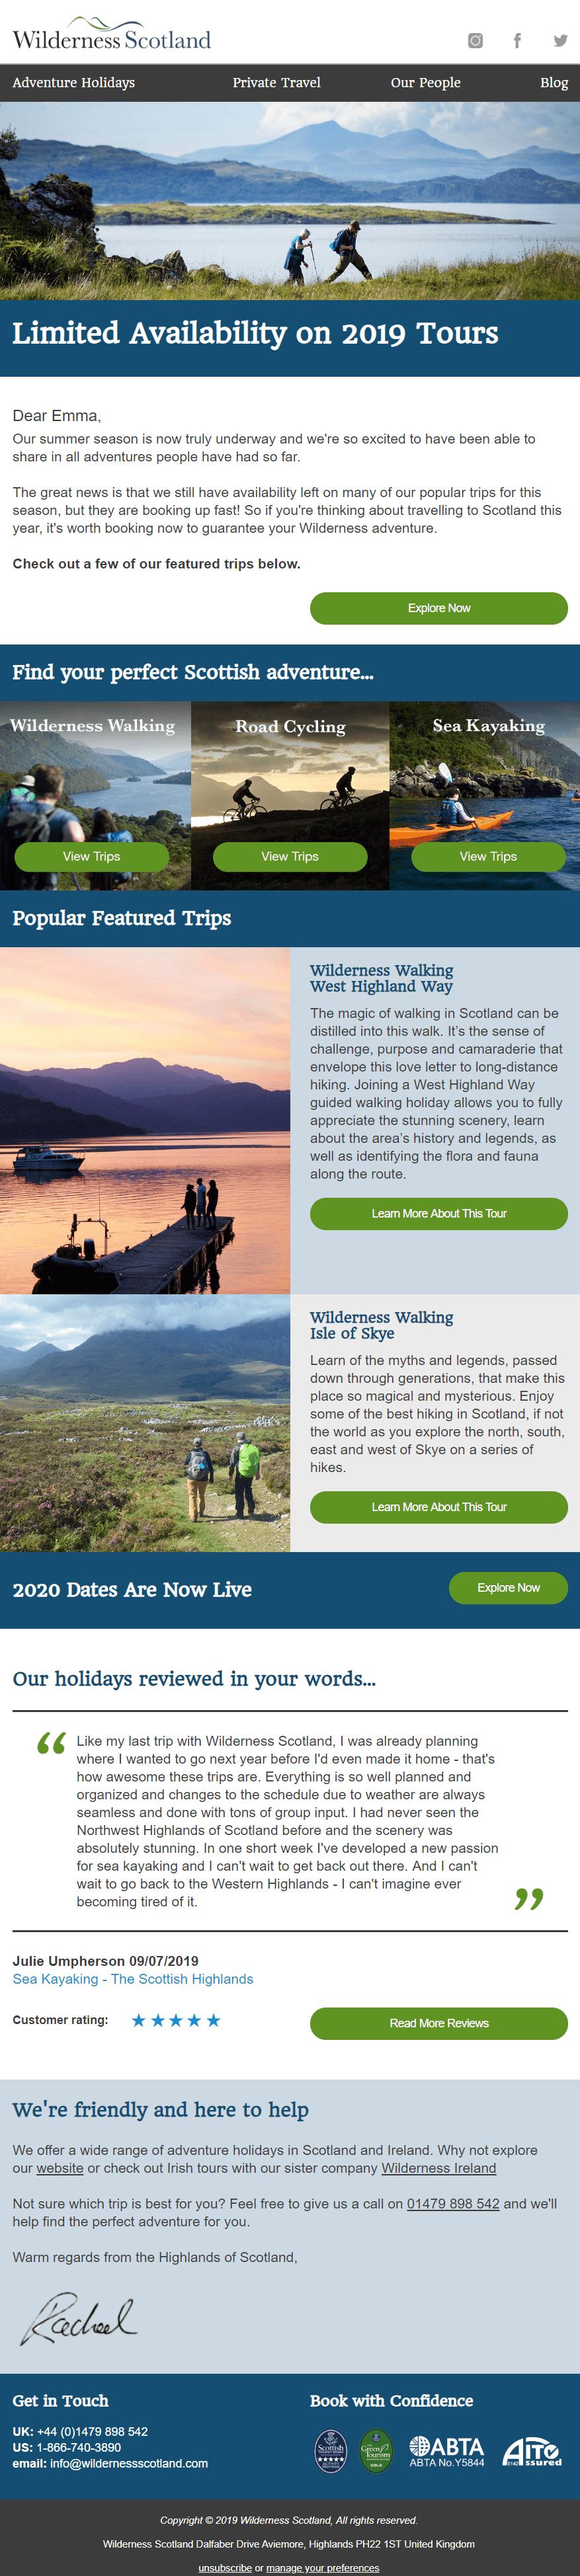 Email marketing example Wilderness Scotland